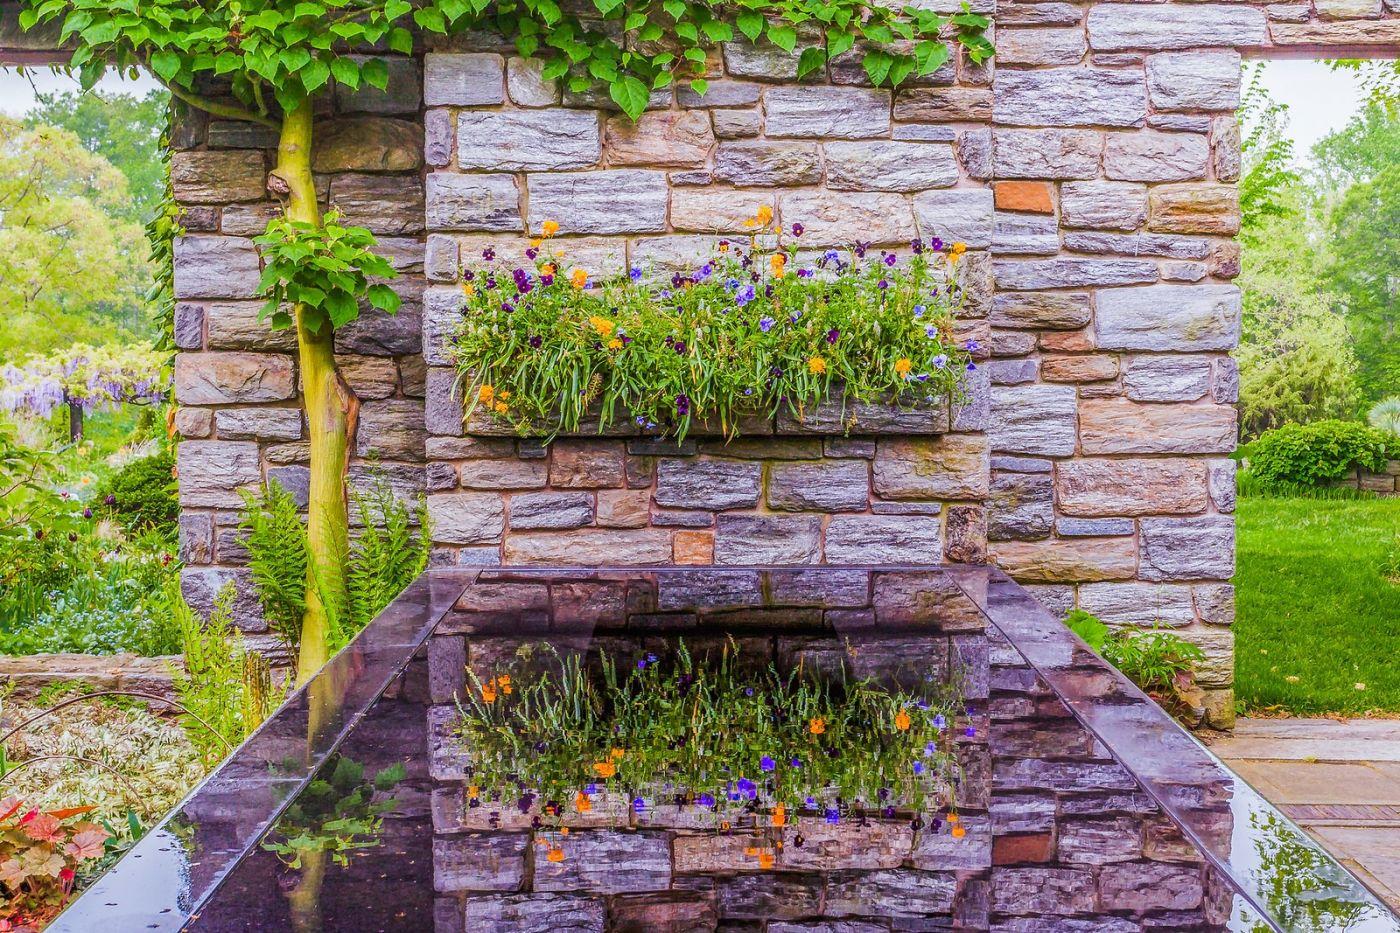 Chanticleer花园,一景一画_图1-19